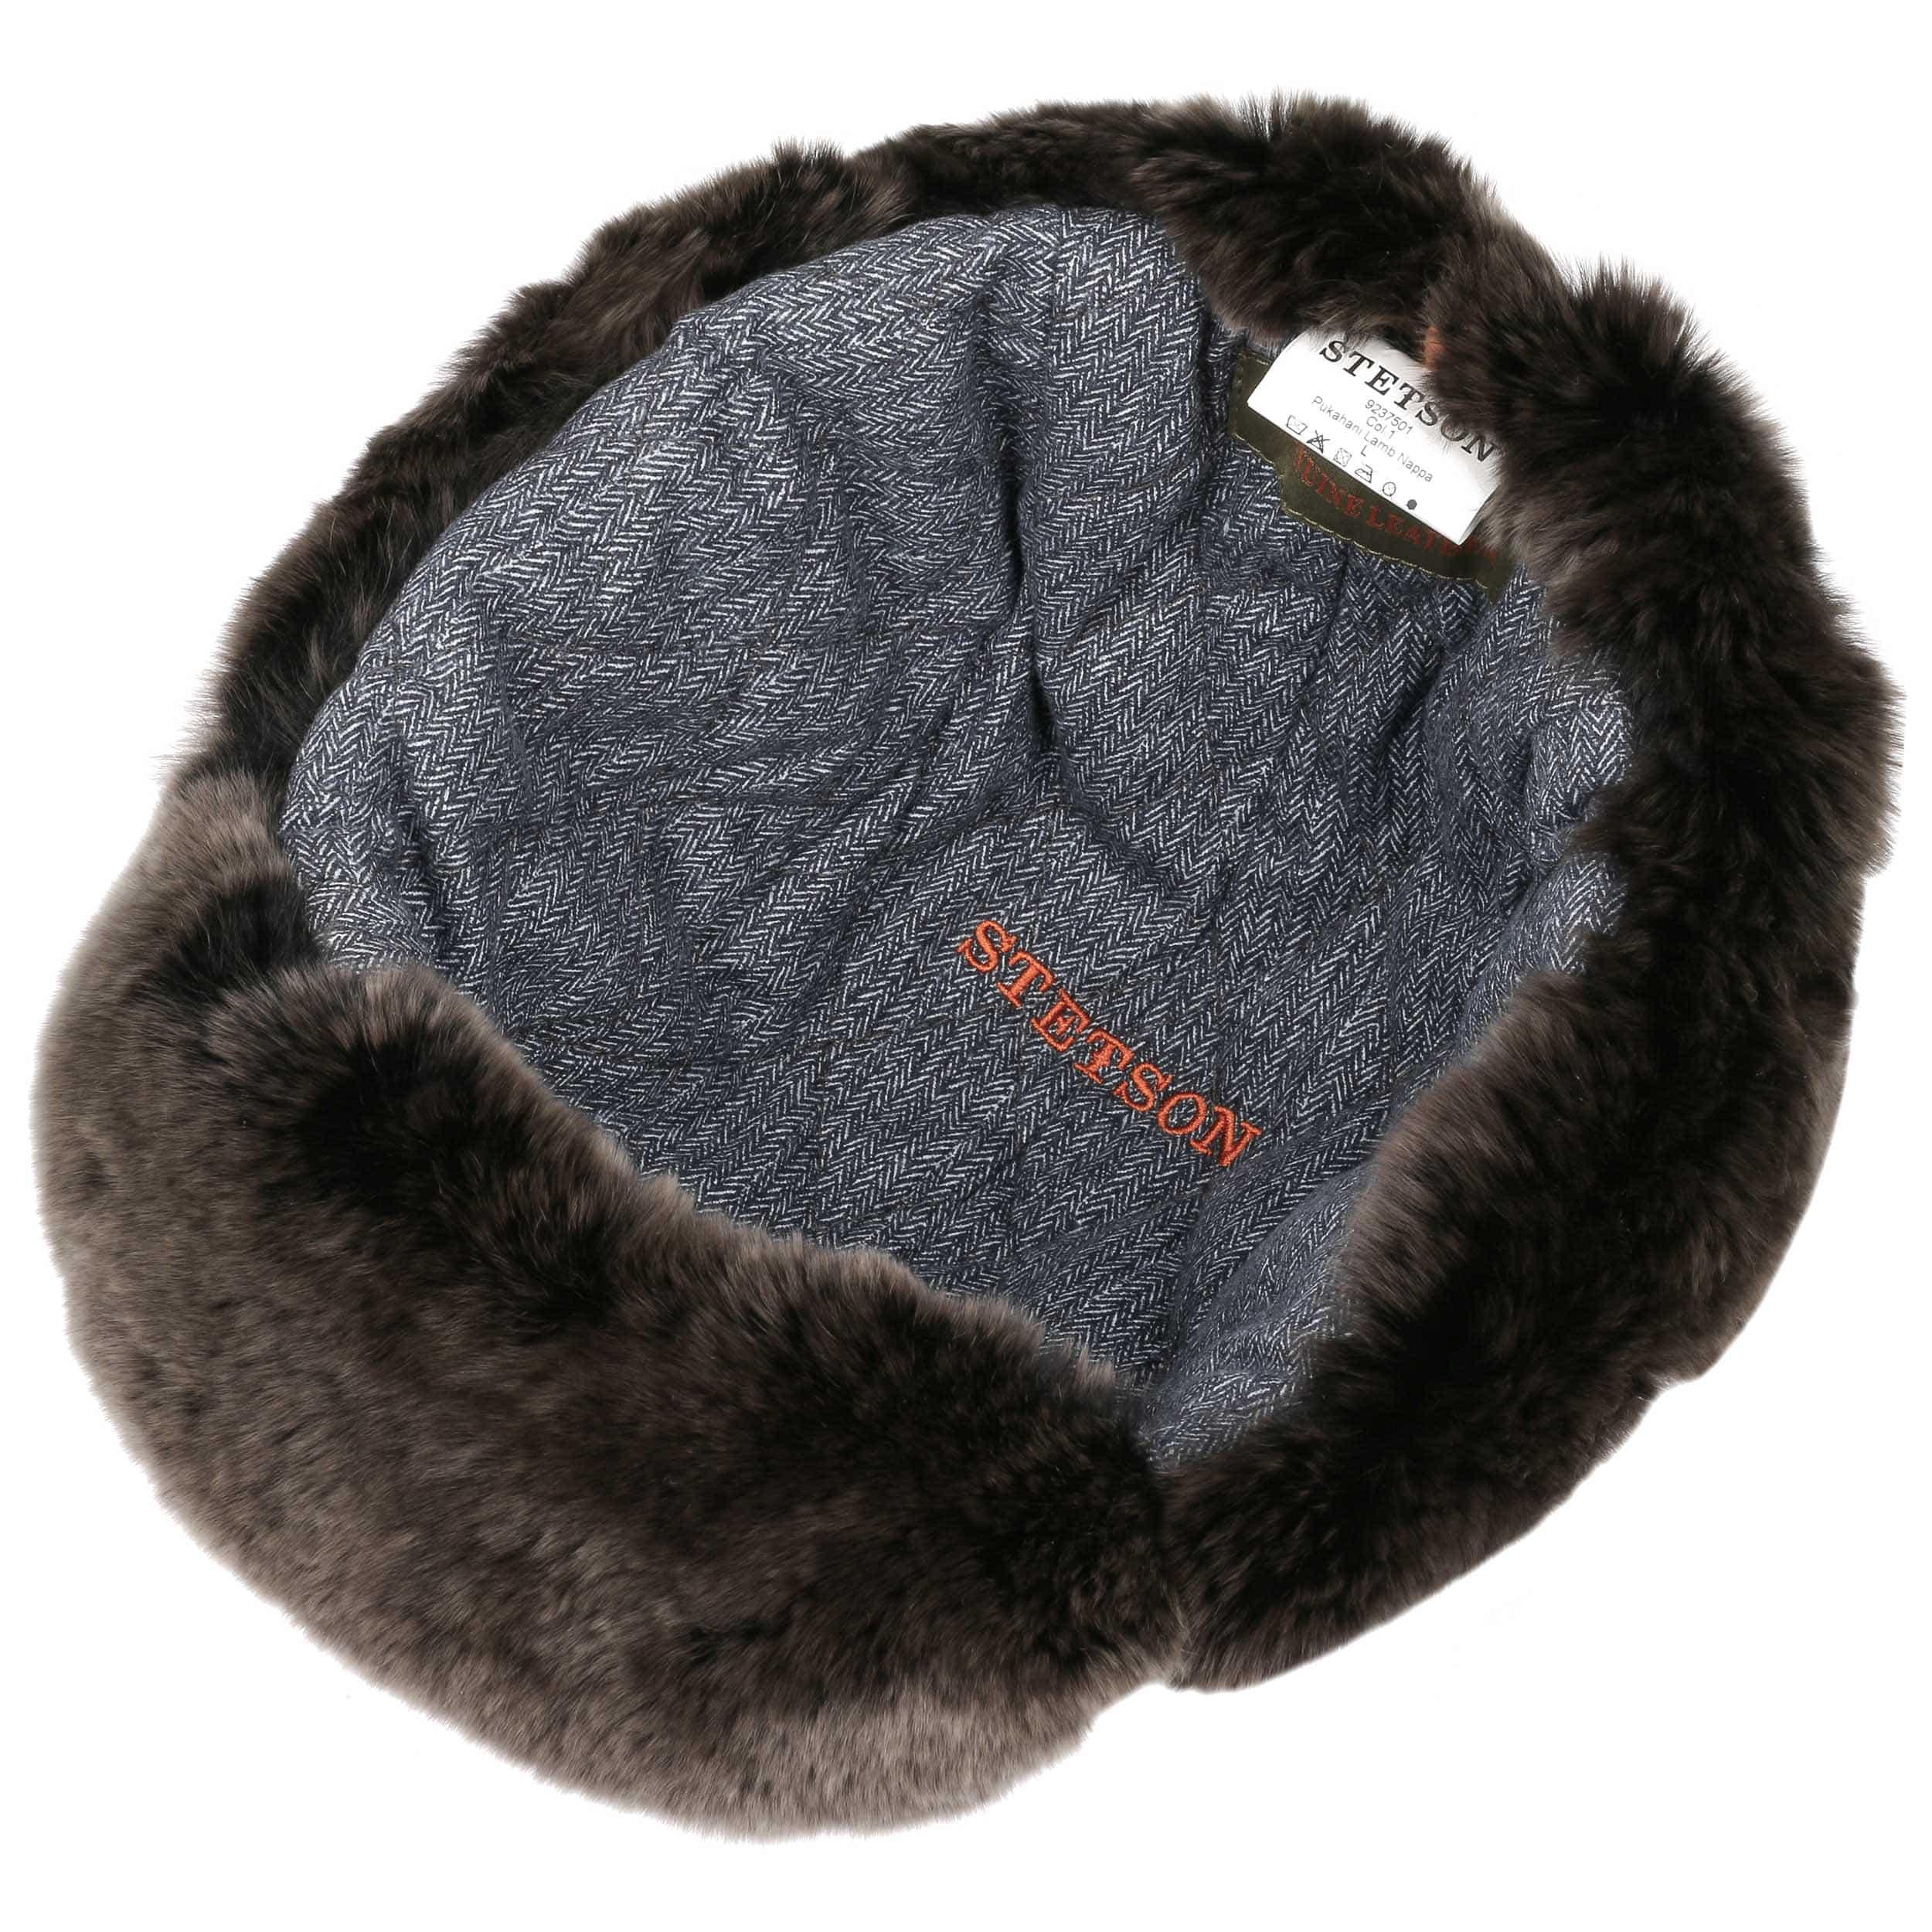 ... Pukahani Leather Aviator Hat by Stetson - black 2 ... 3bc0deb8ce8